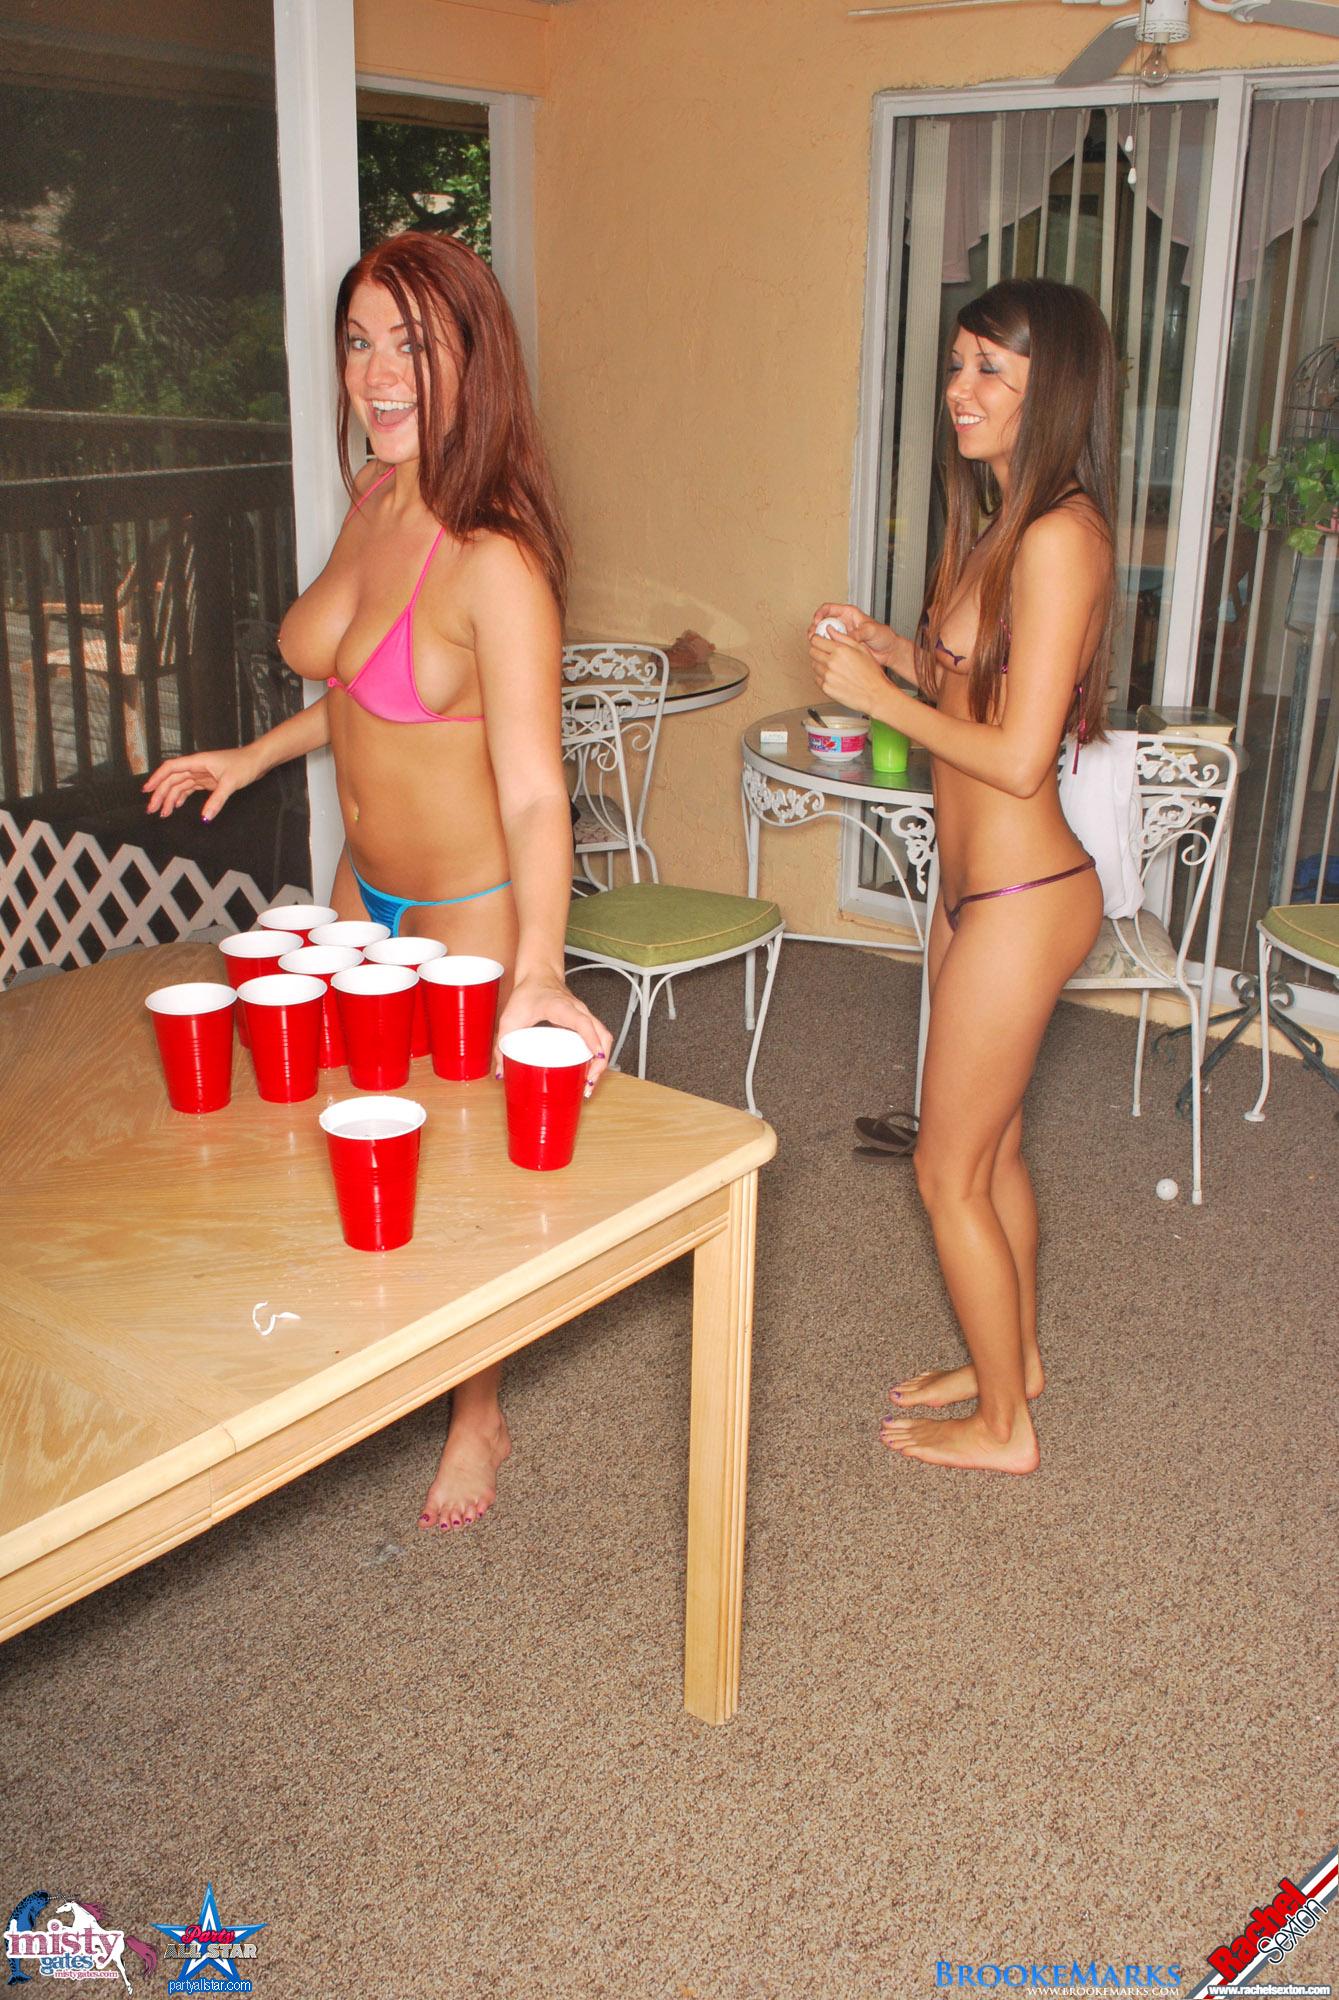 Girls drunk beer pong naked girls nude tennis cowboy